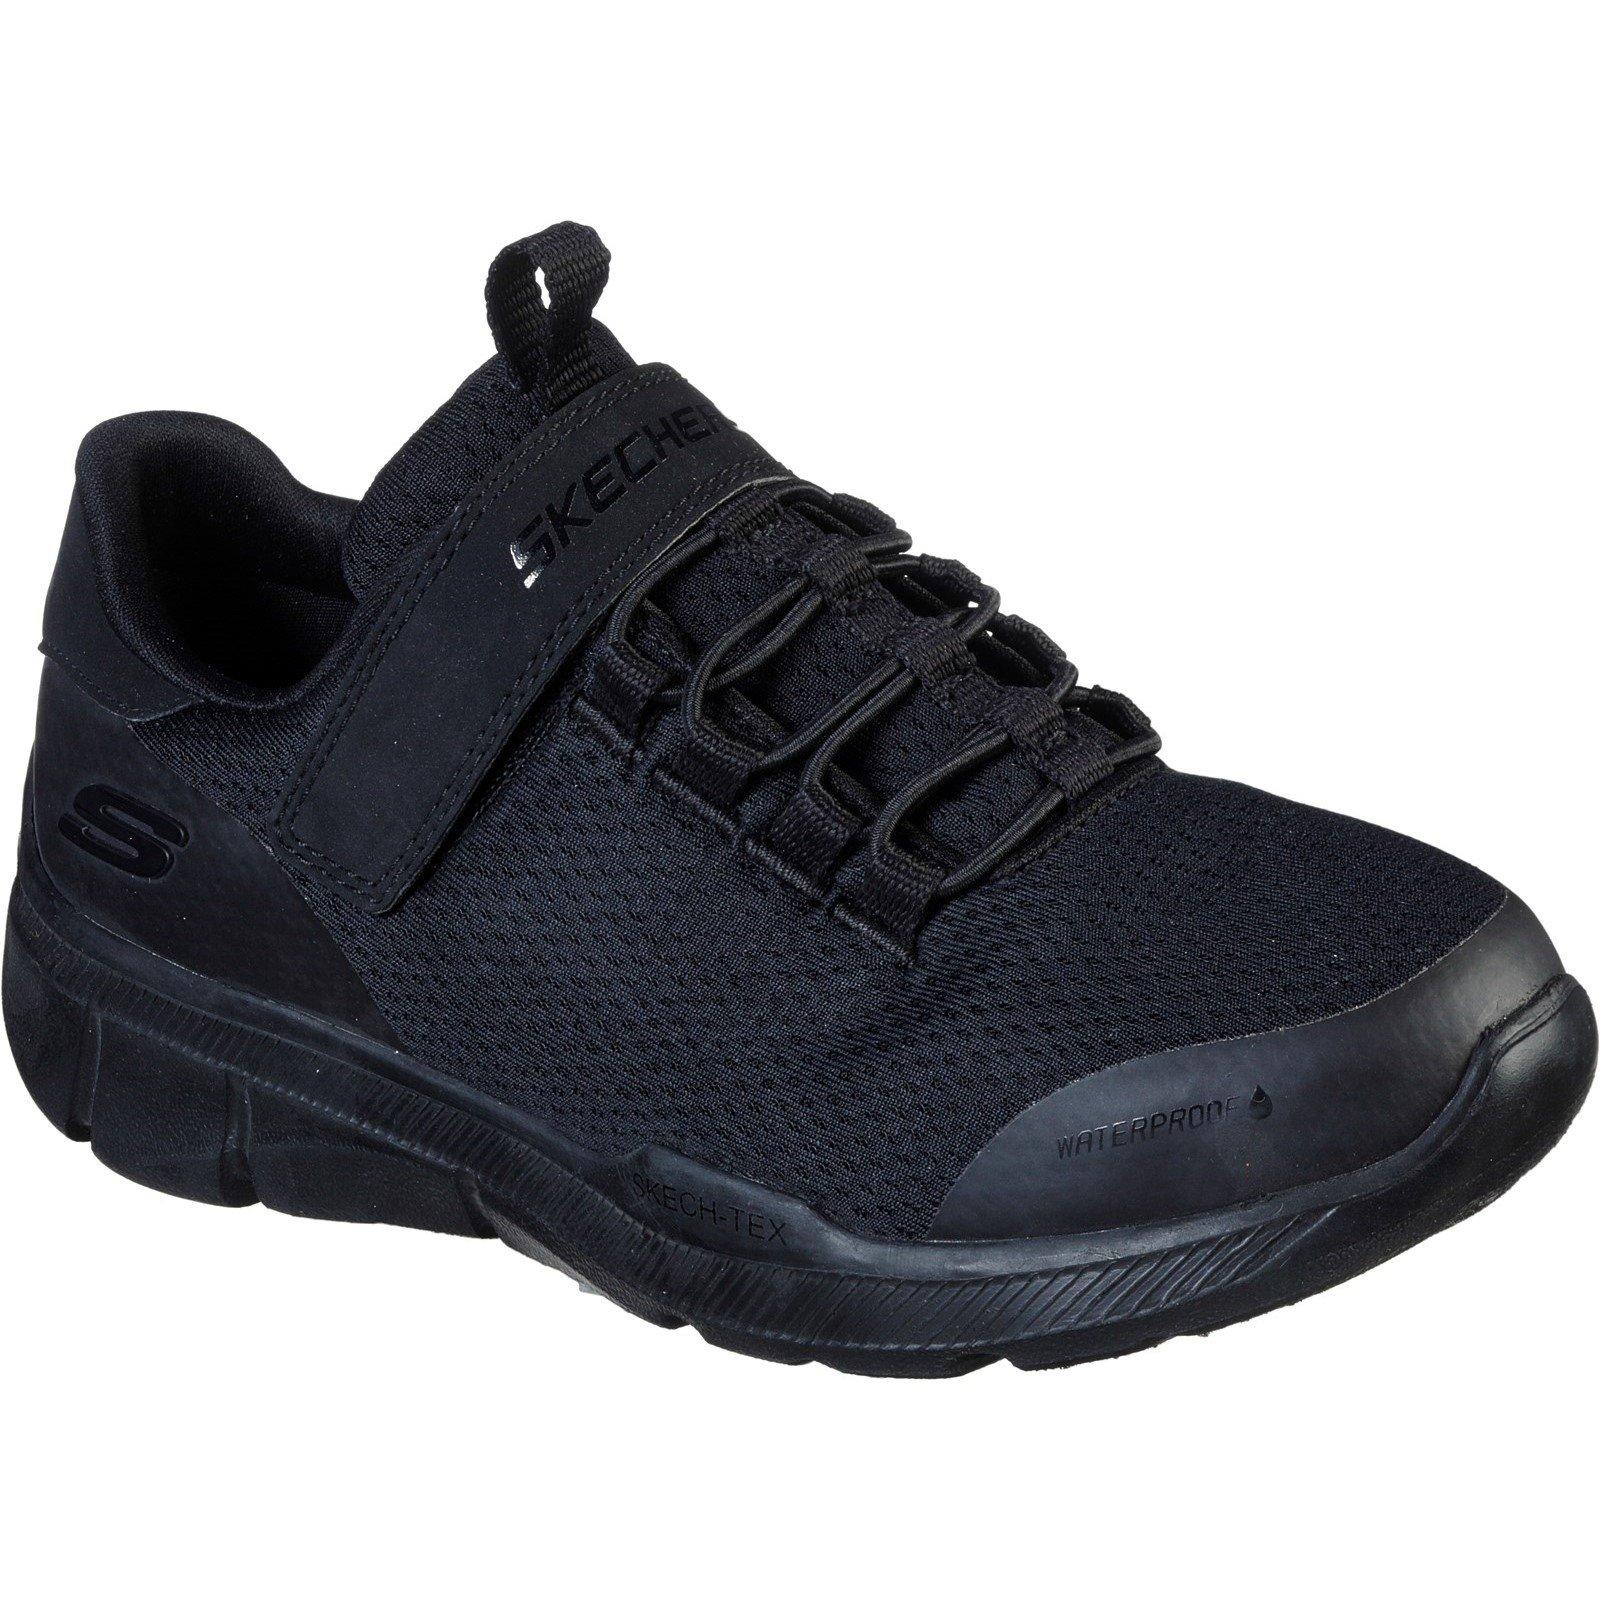 Skechers Unisex Equalizer 3.0 Aquablast Trainer Black 28533 - Black 13